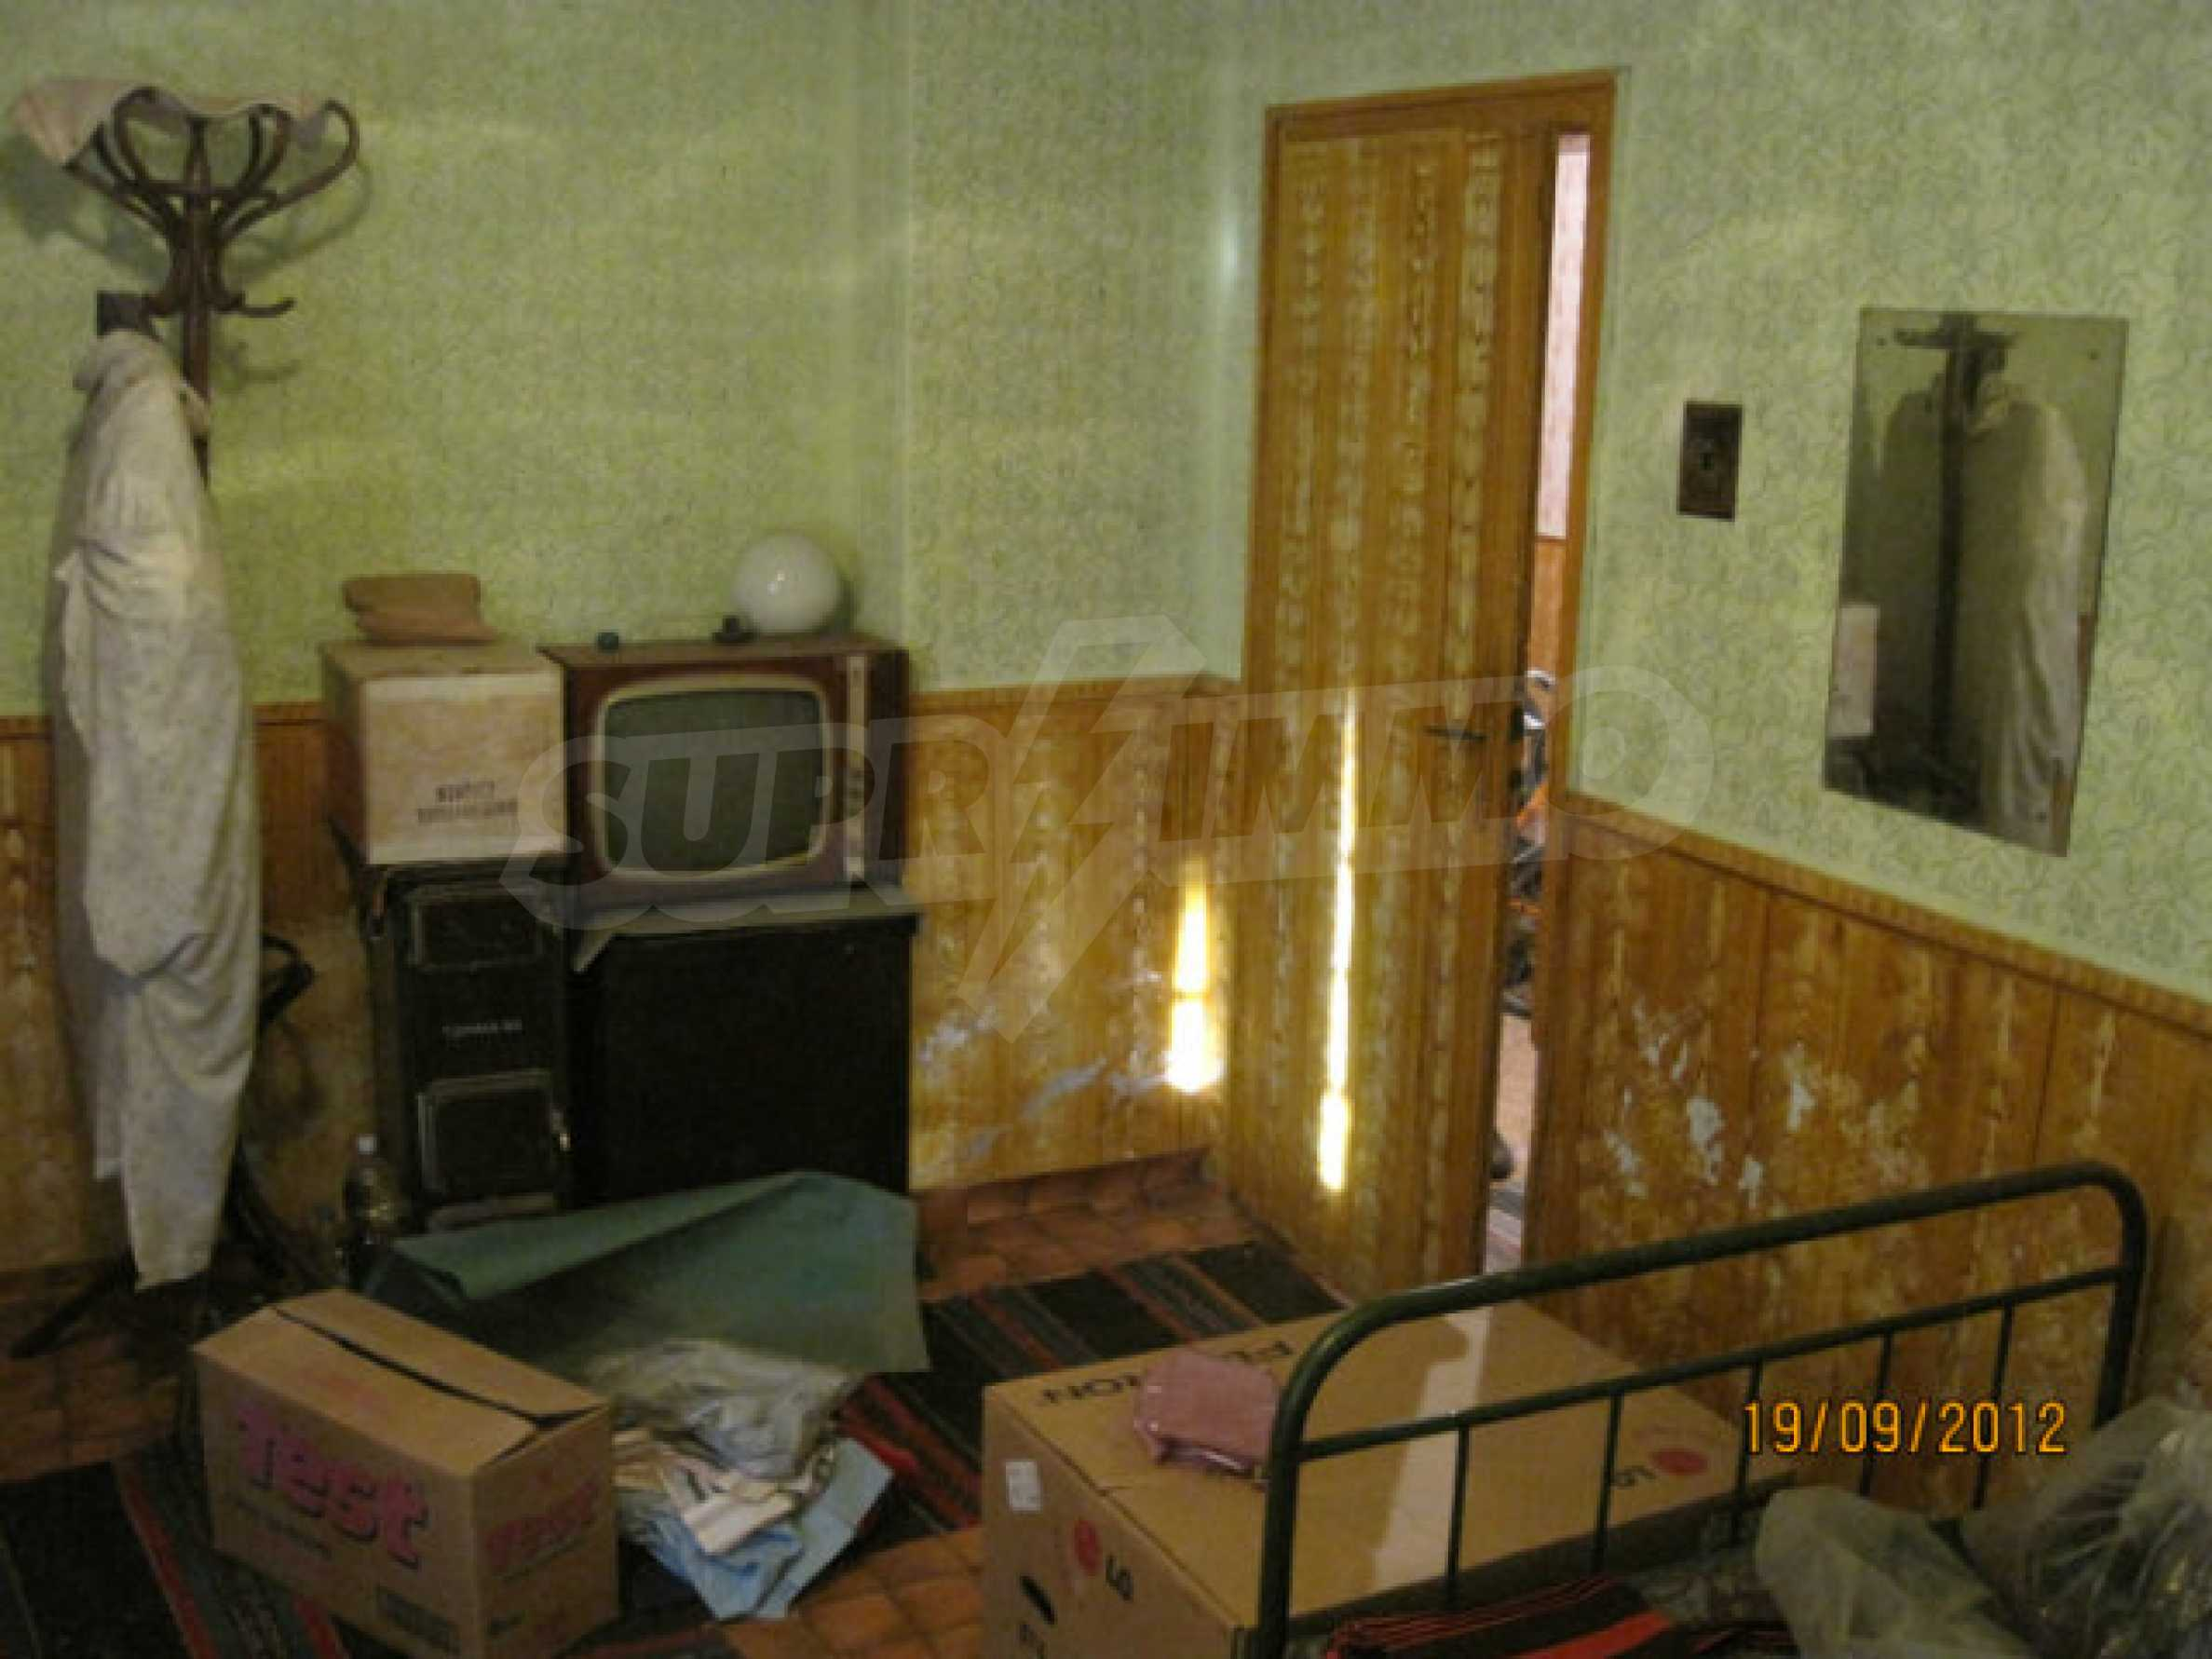 Detached house for sale in a quiet village near Dimitrovgrad 4